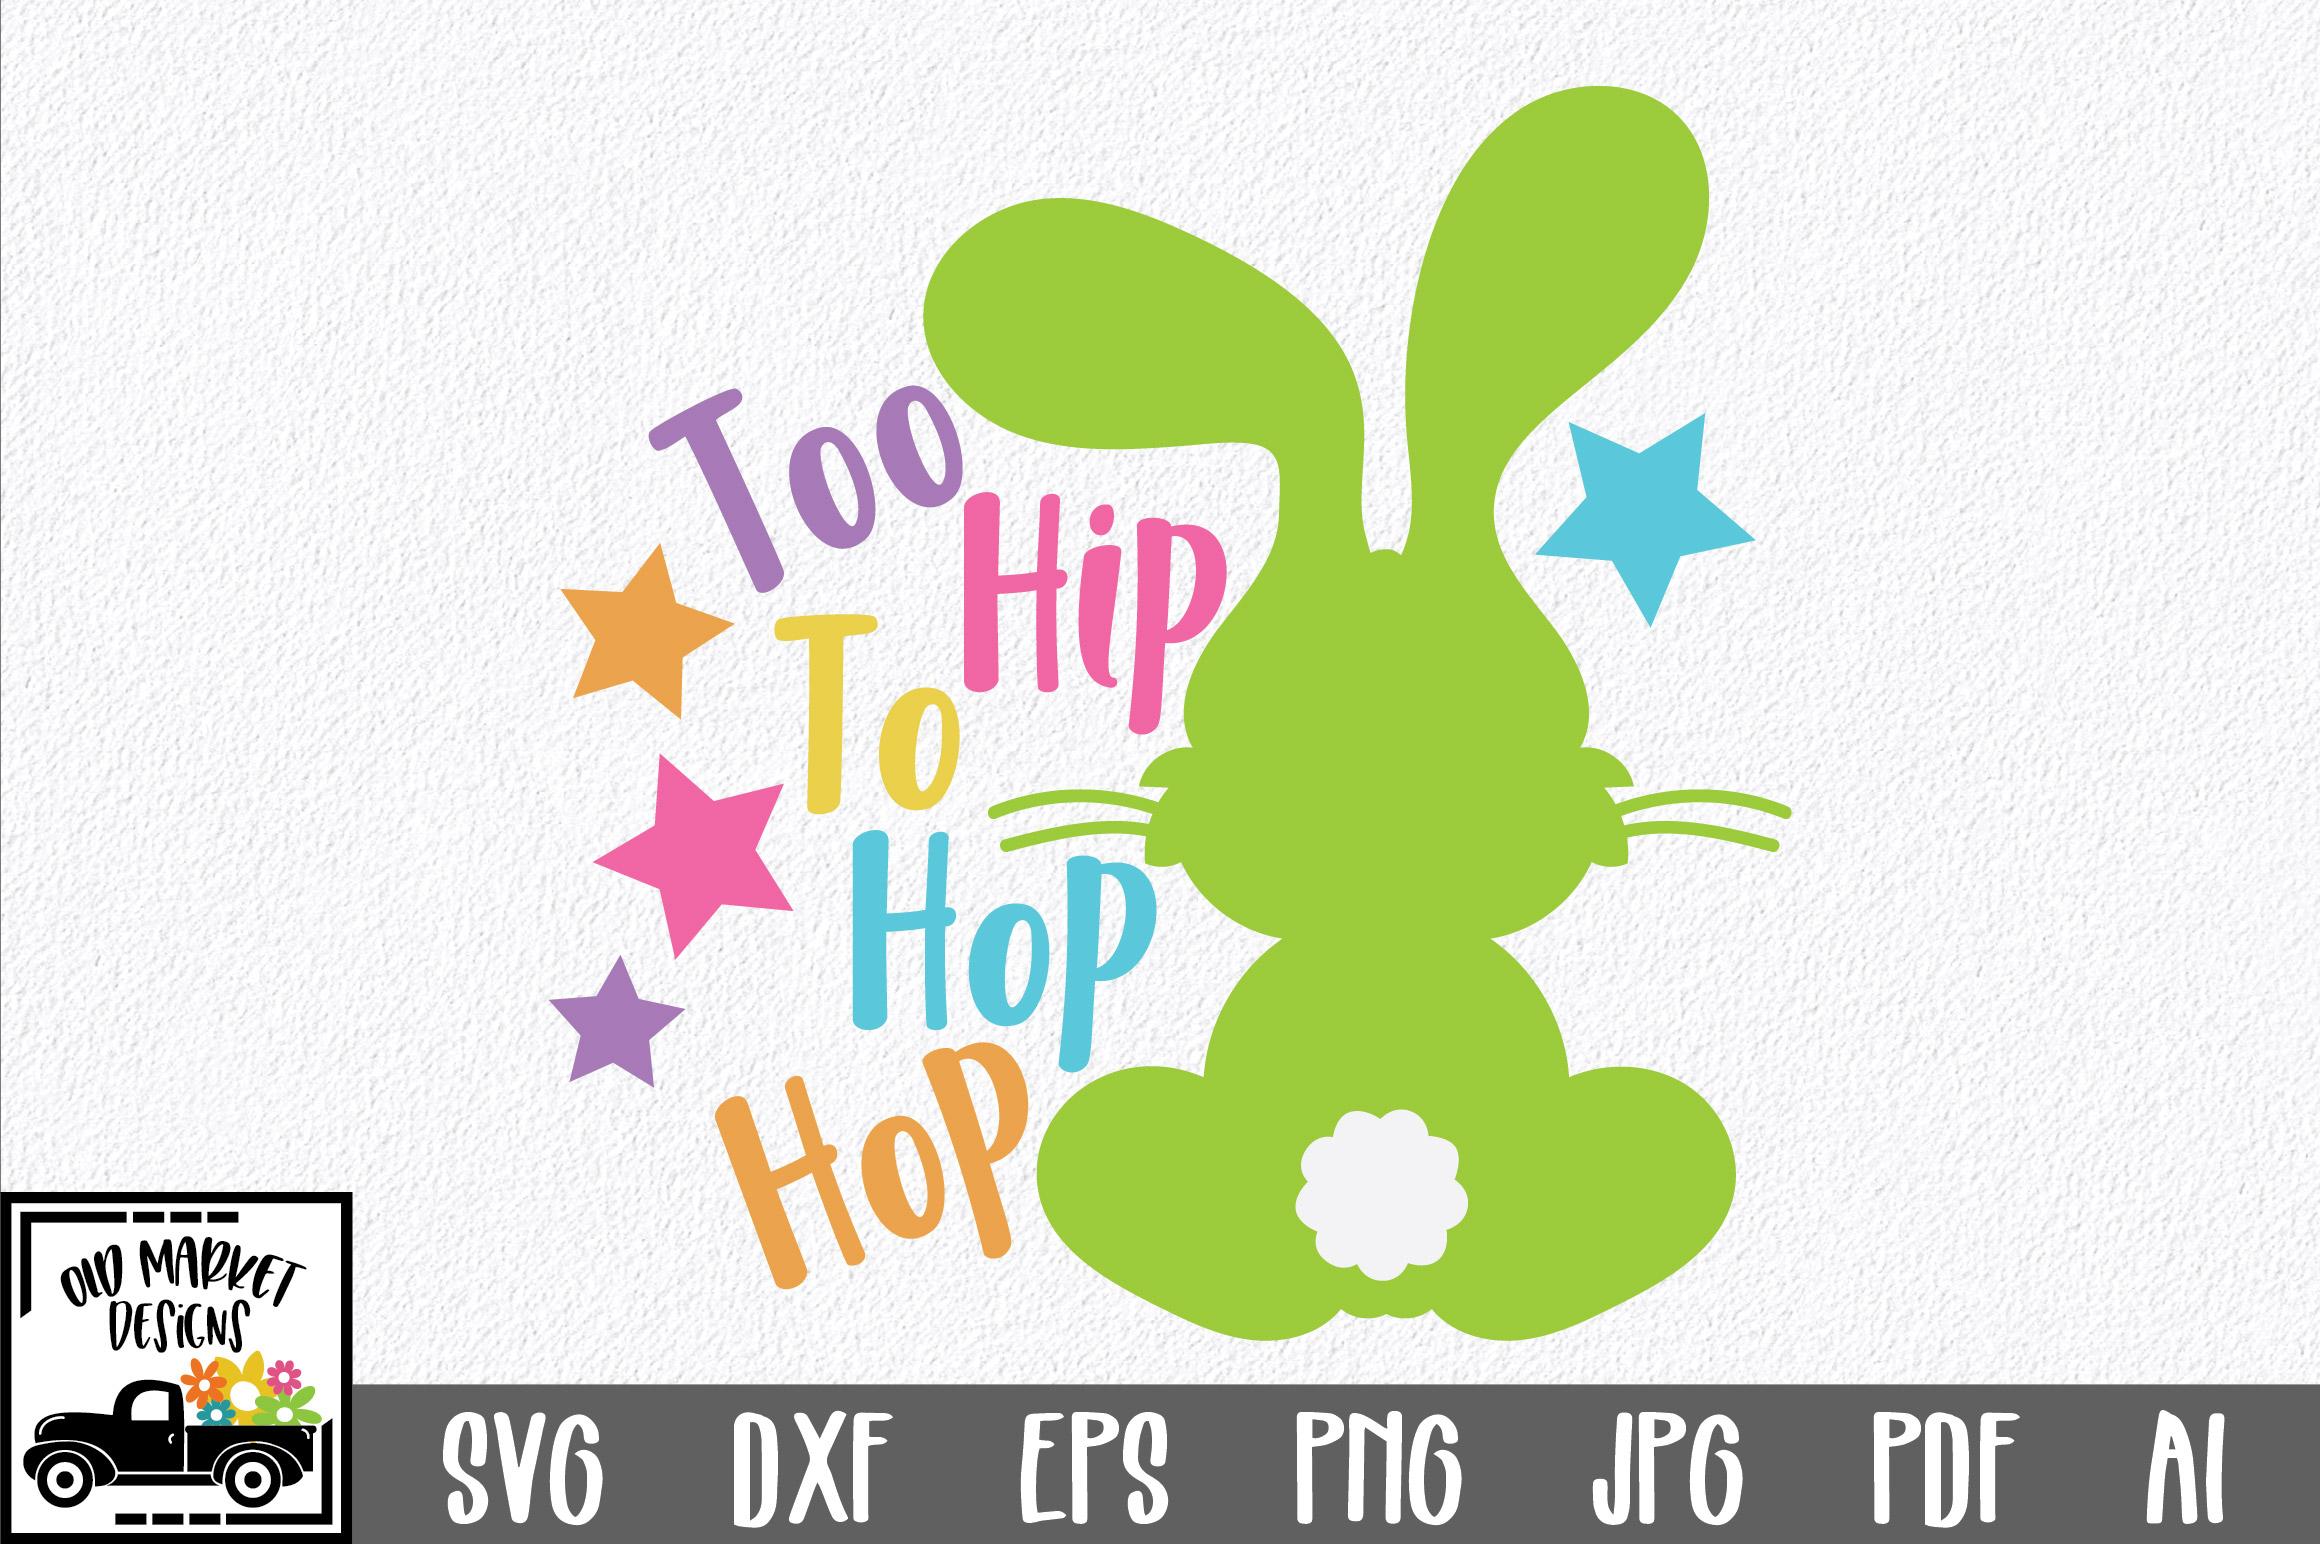 Easter SVG Cut File - Too Hip to Hop Hop SVG DXF EPS PNG JPG example image 1